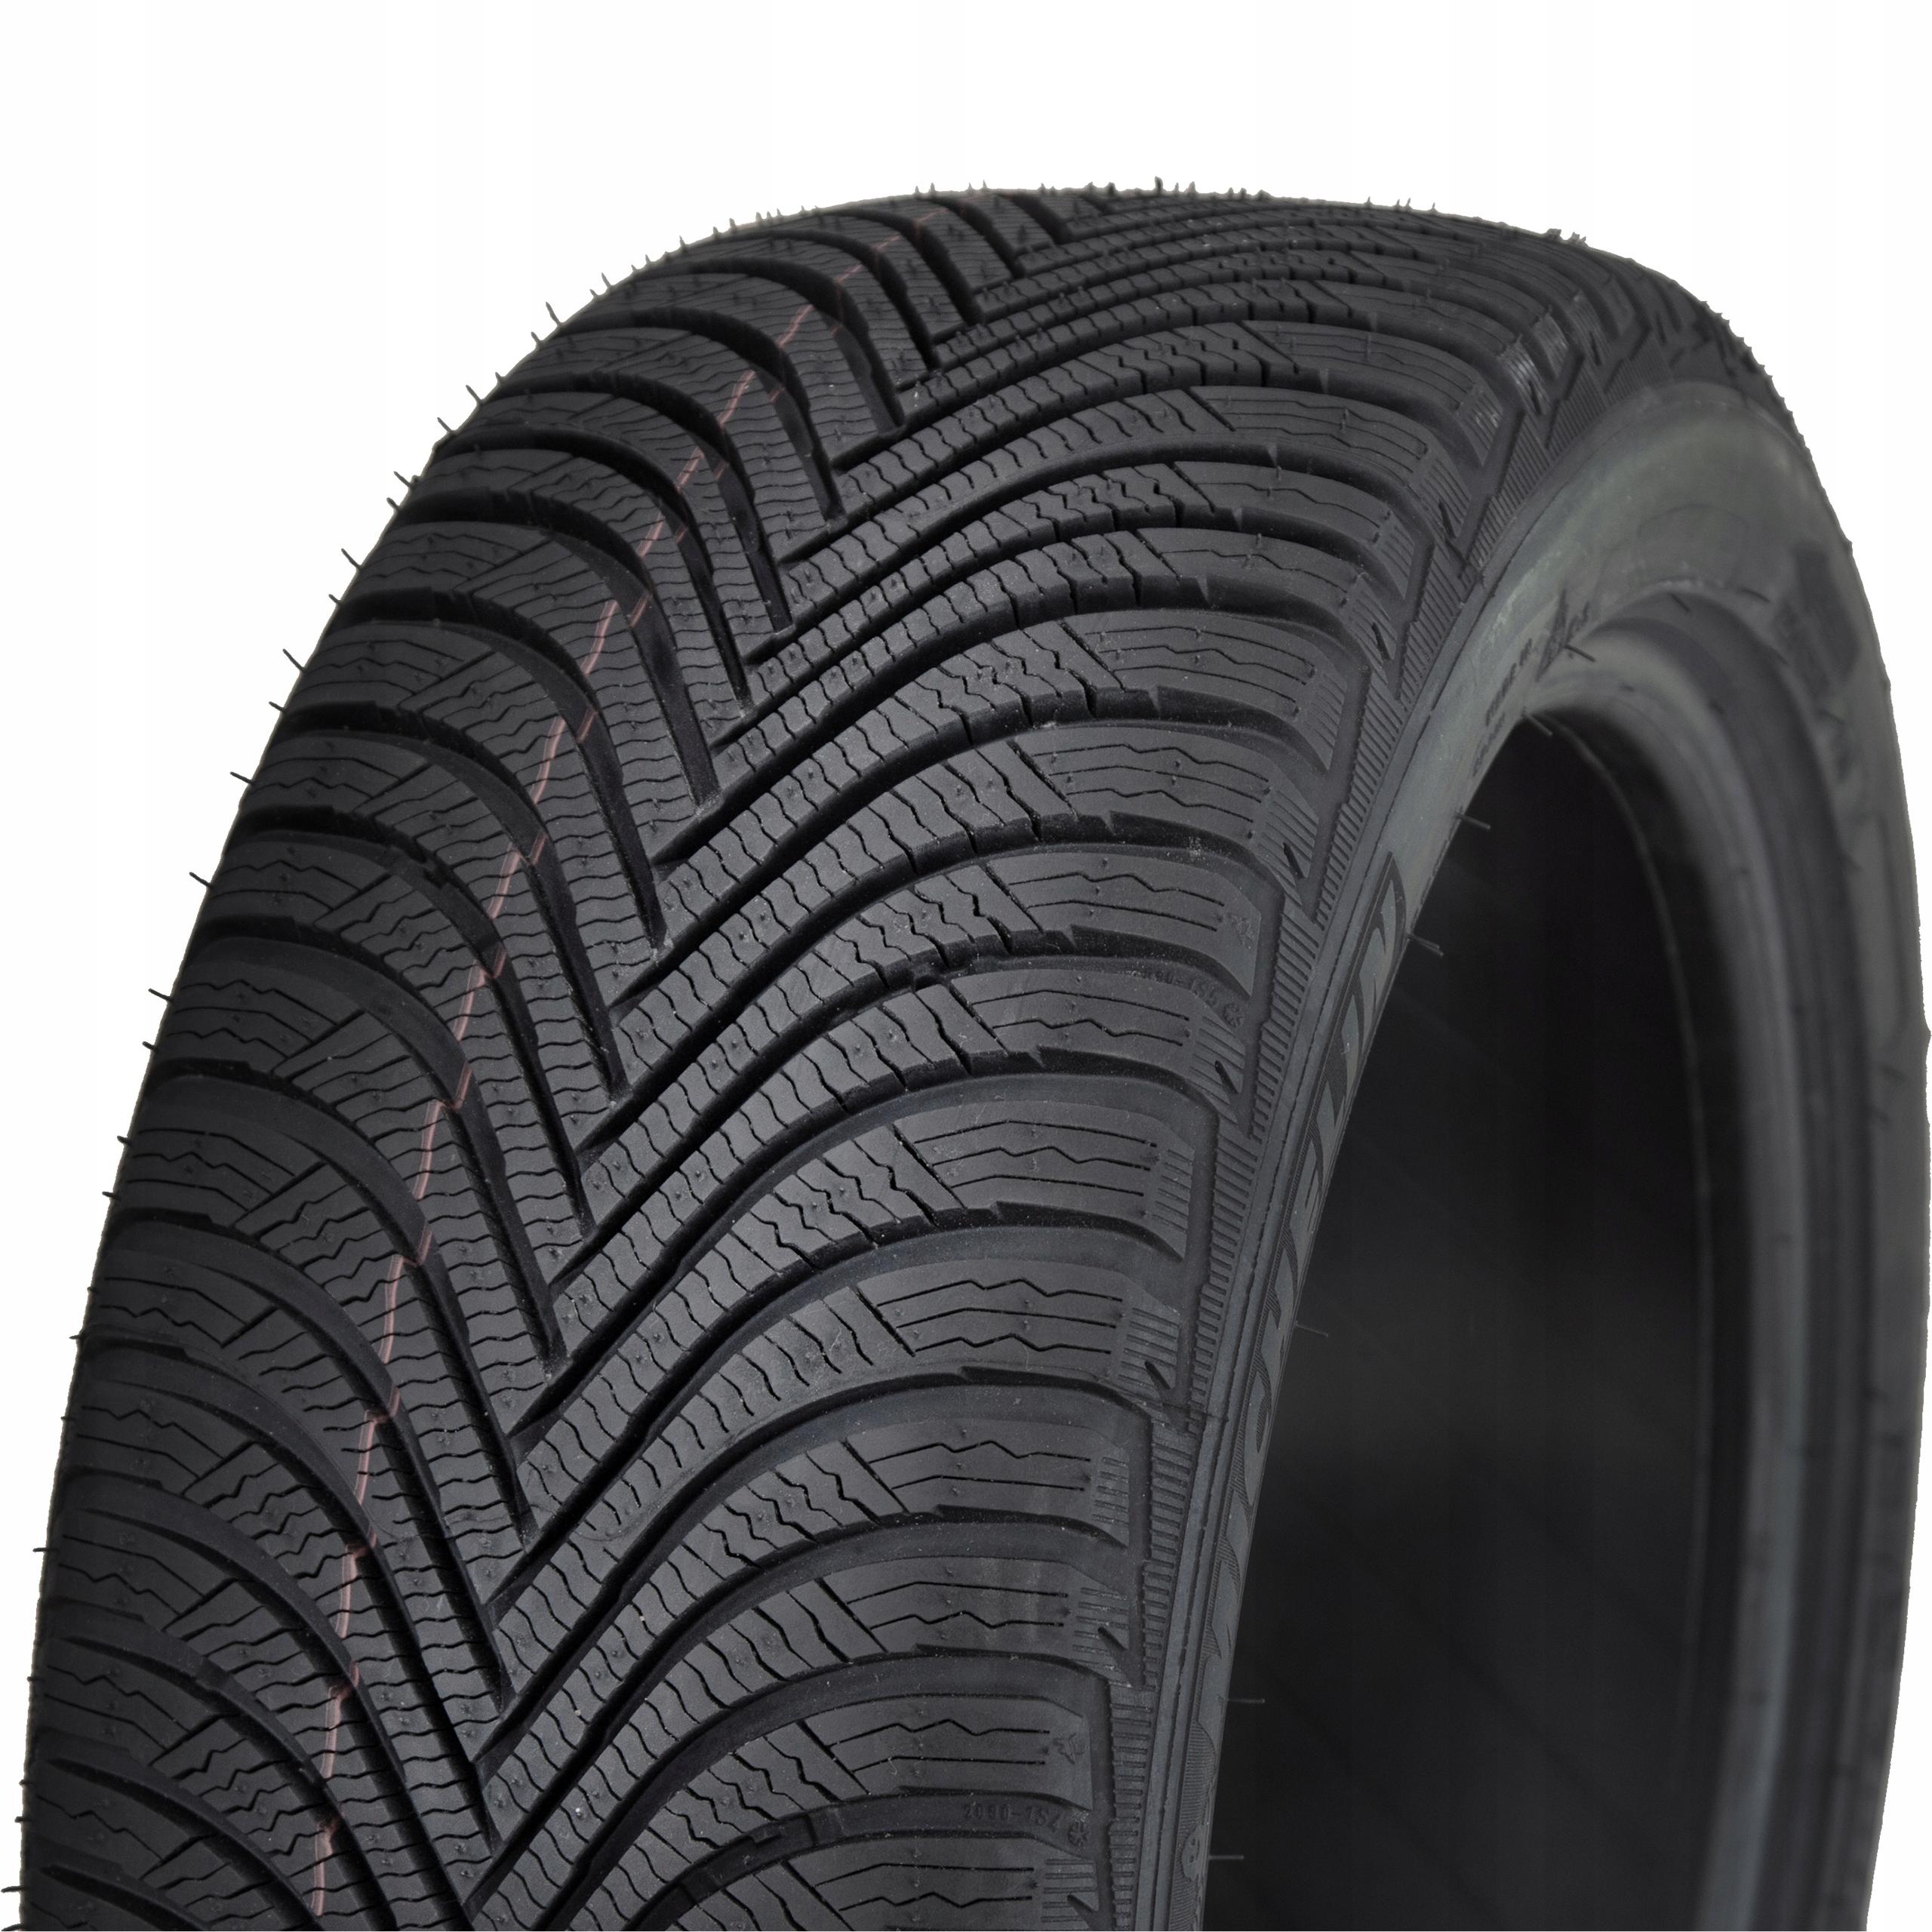 4x Opony Zimowe 20555r16 91t Michelin Alpin 5 7498605797